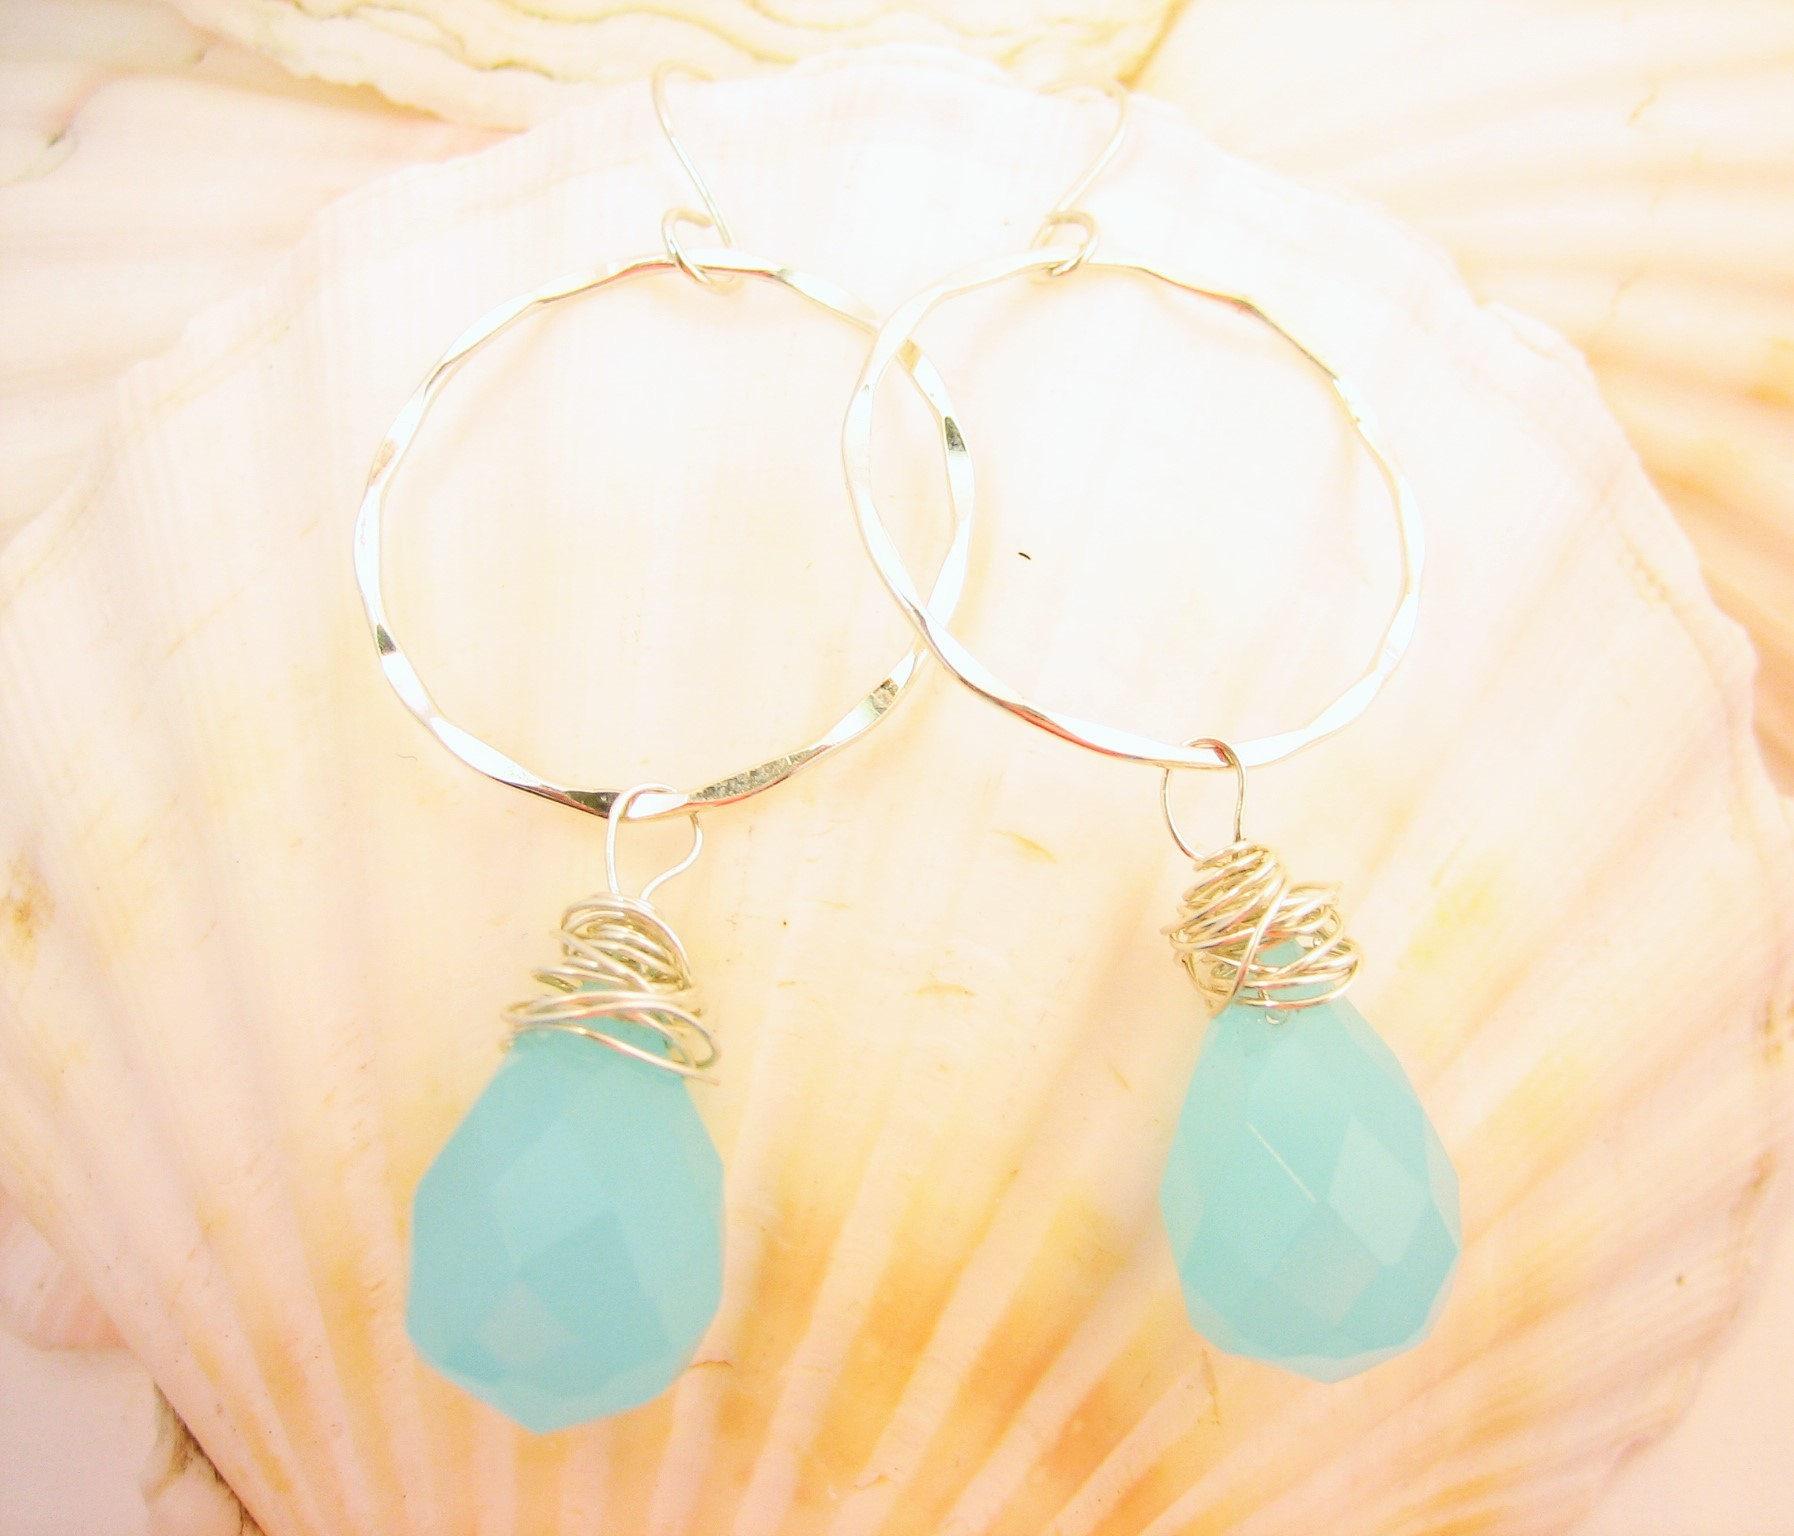 Gypsy hoop hammered silver earrings with aqua blue chalcedony genuine gemstone, dangle open circle artisan handmade hammered silver earrings